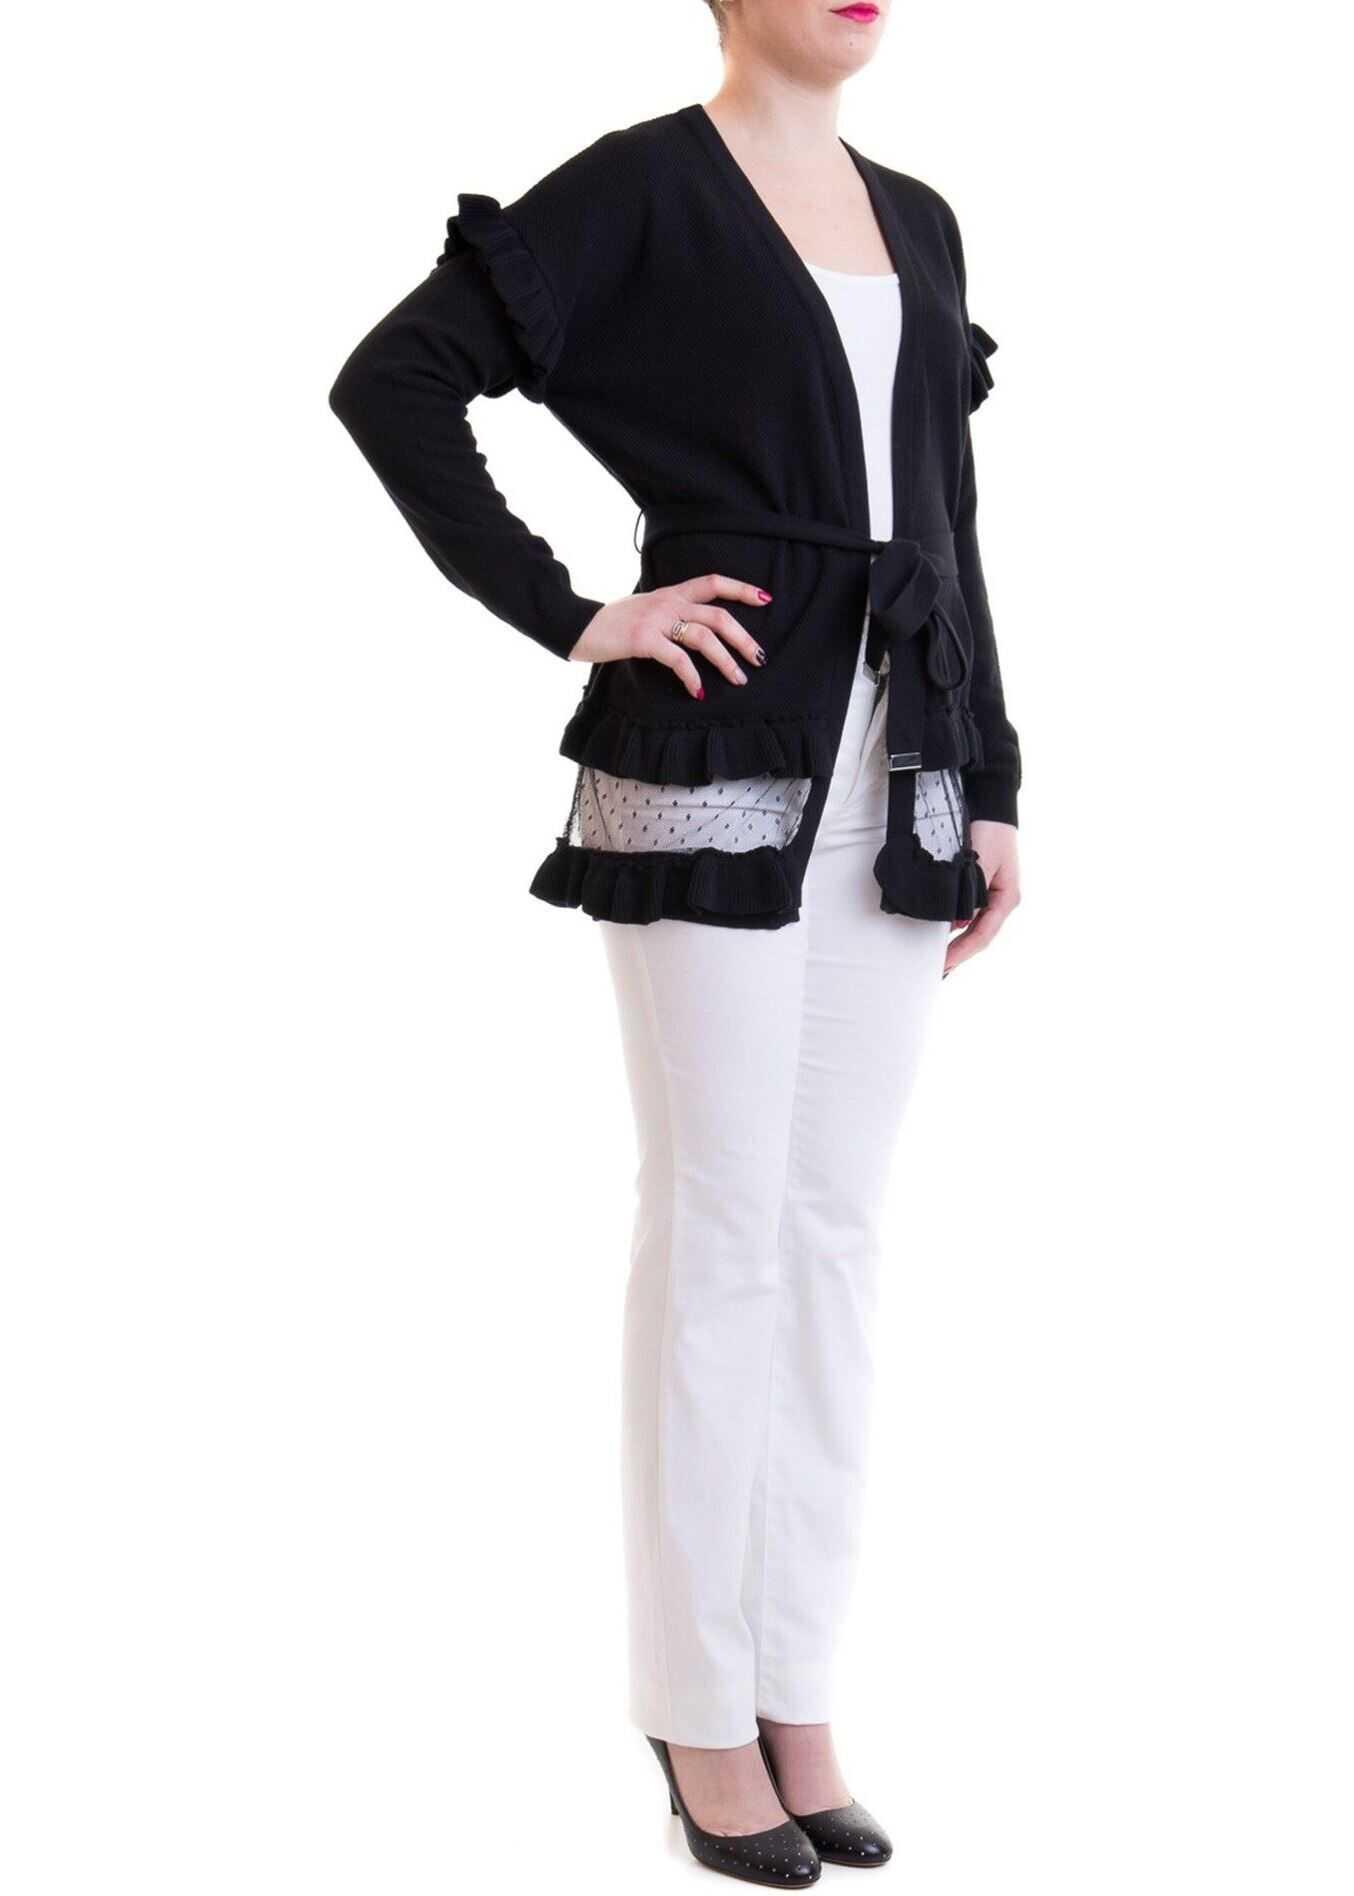 Be Blumarine Polka Dot Tulle Bottom Cardigan In Black Black